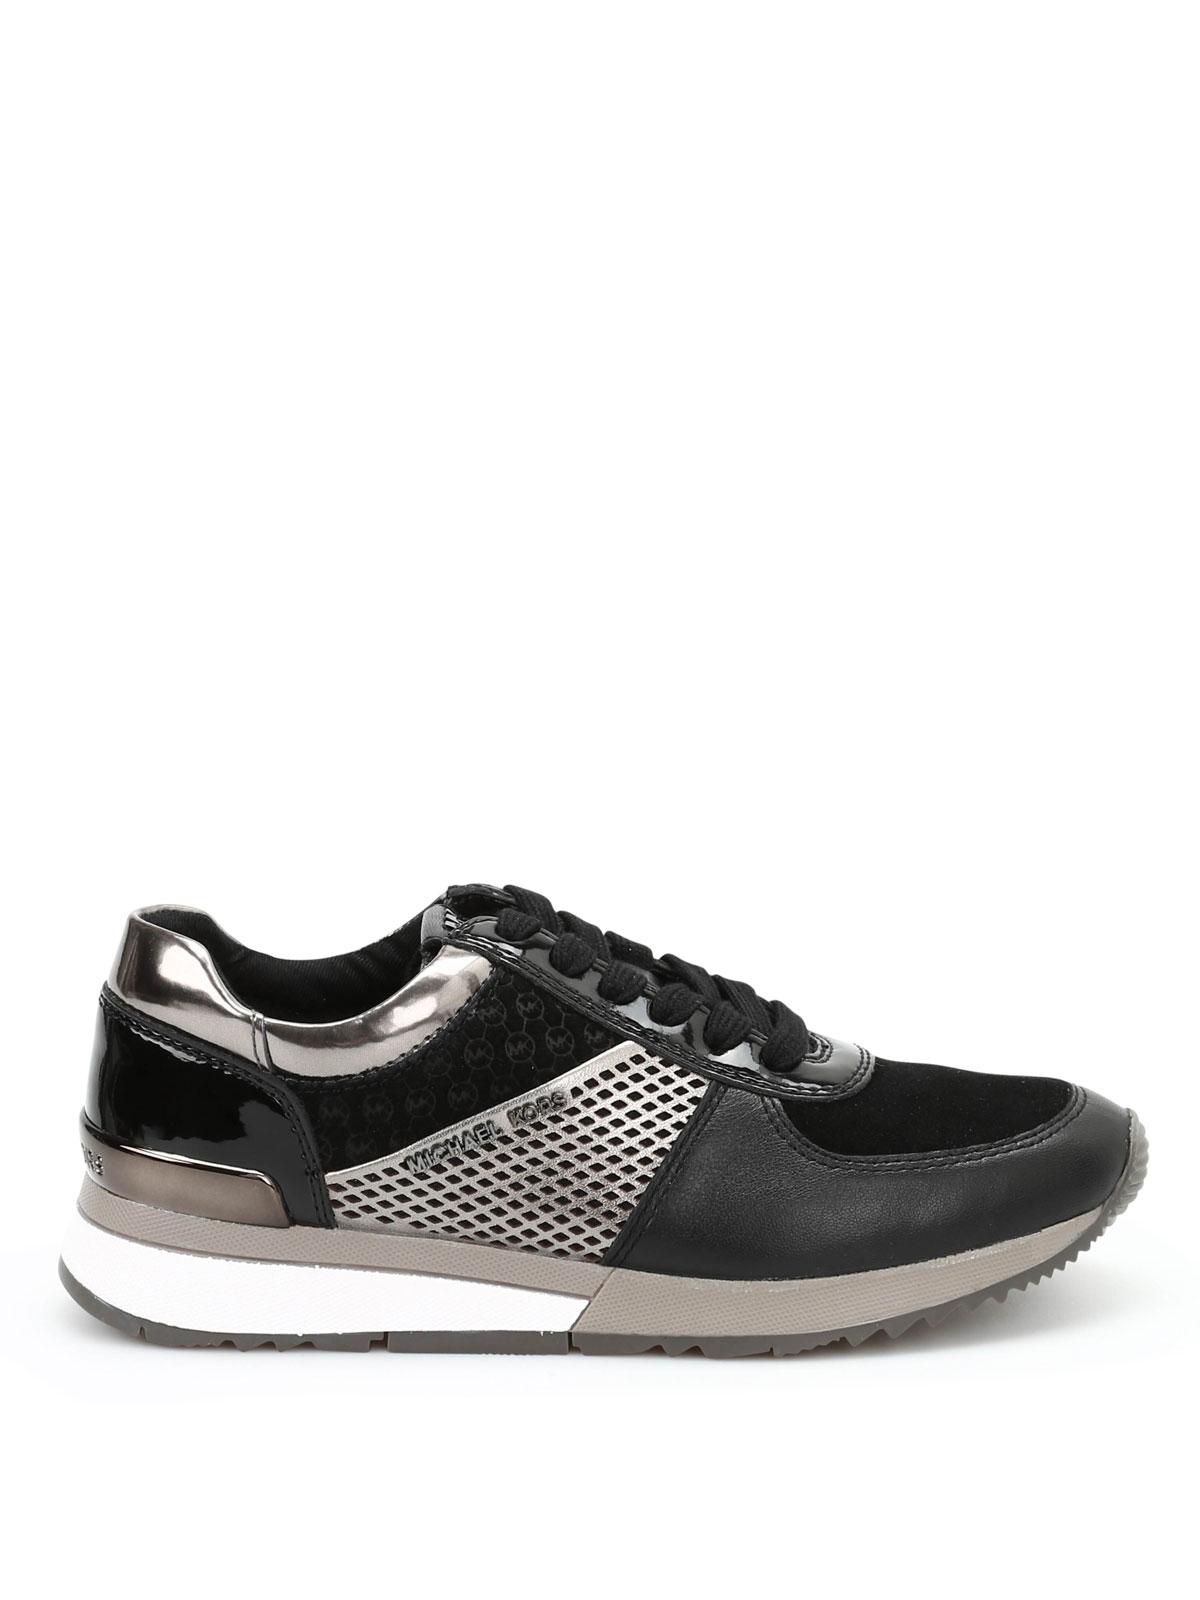 Michael Kors Allie Sneakers Trainers 43t5alfp1m 934